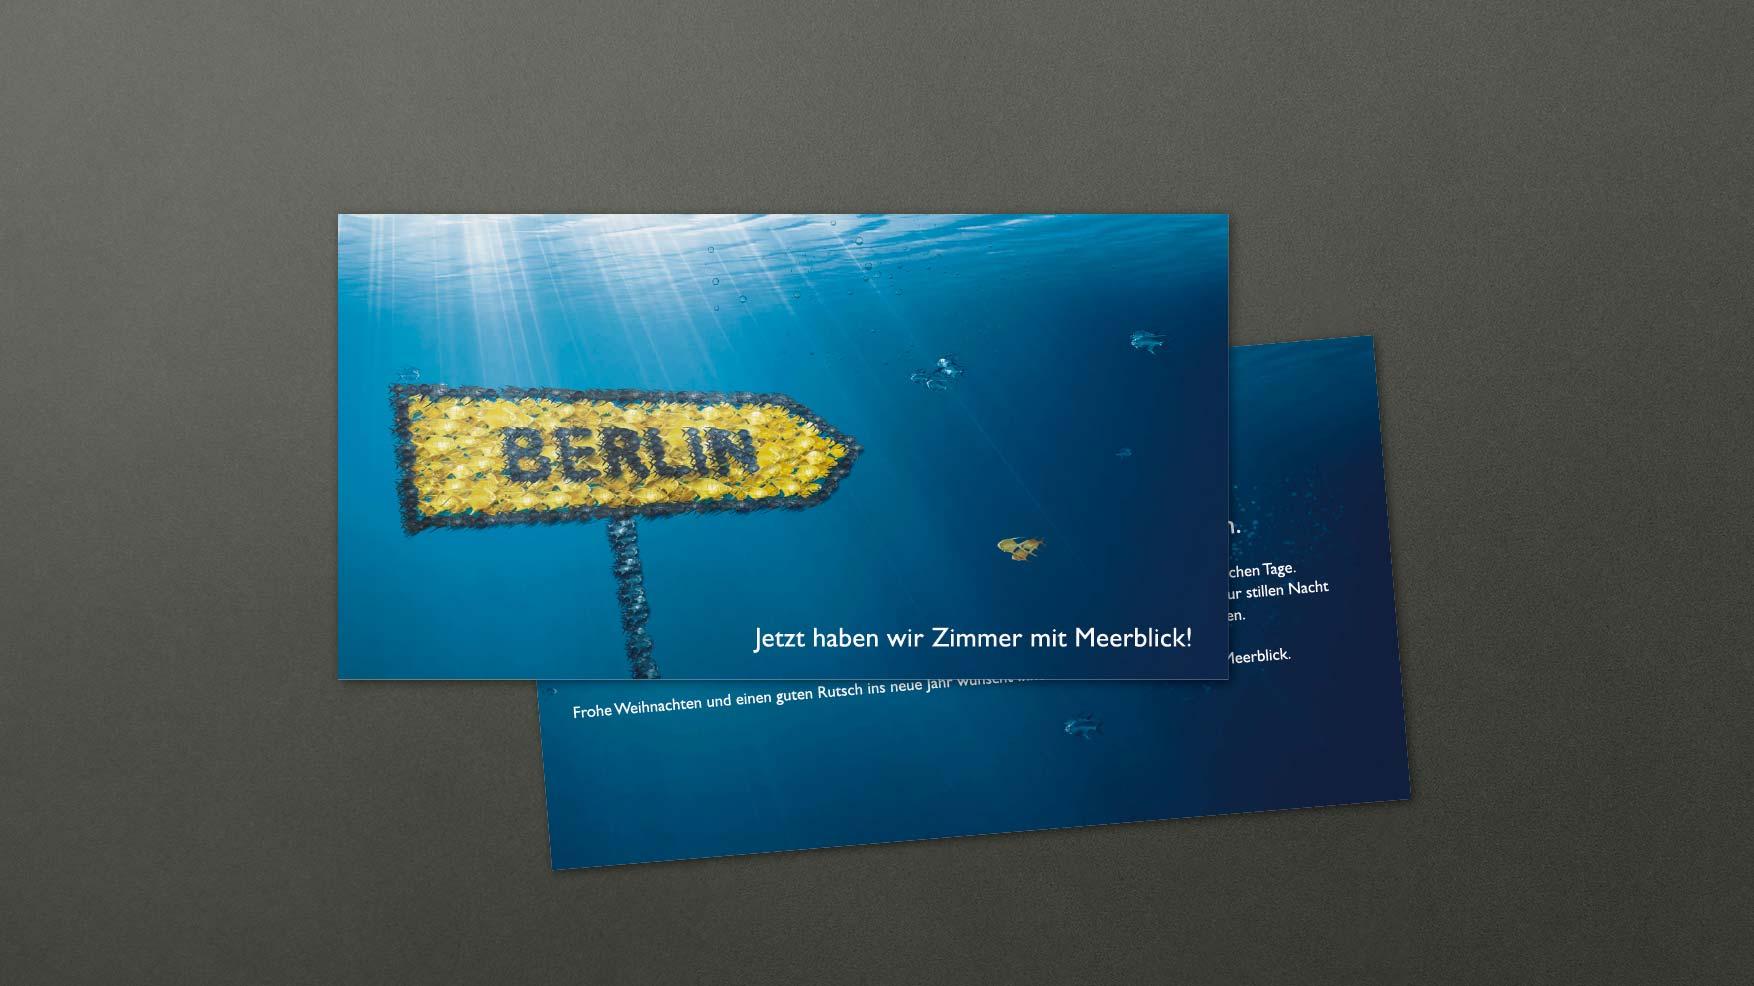 Radisson Berlin Eröffnung Mailing